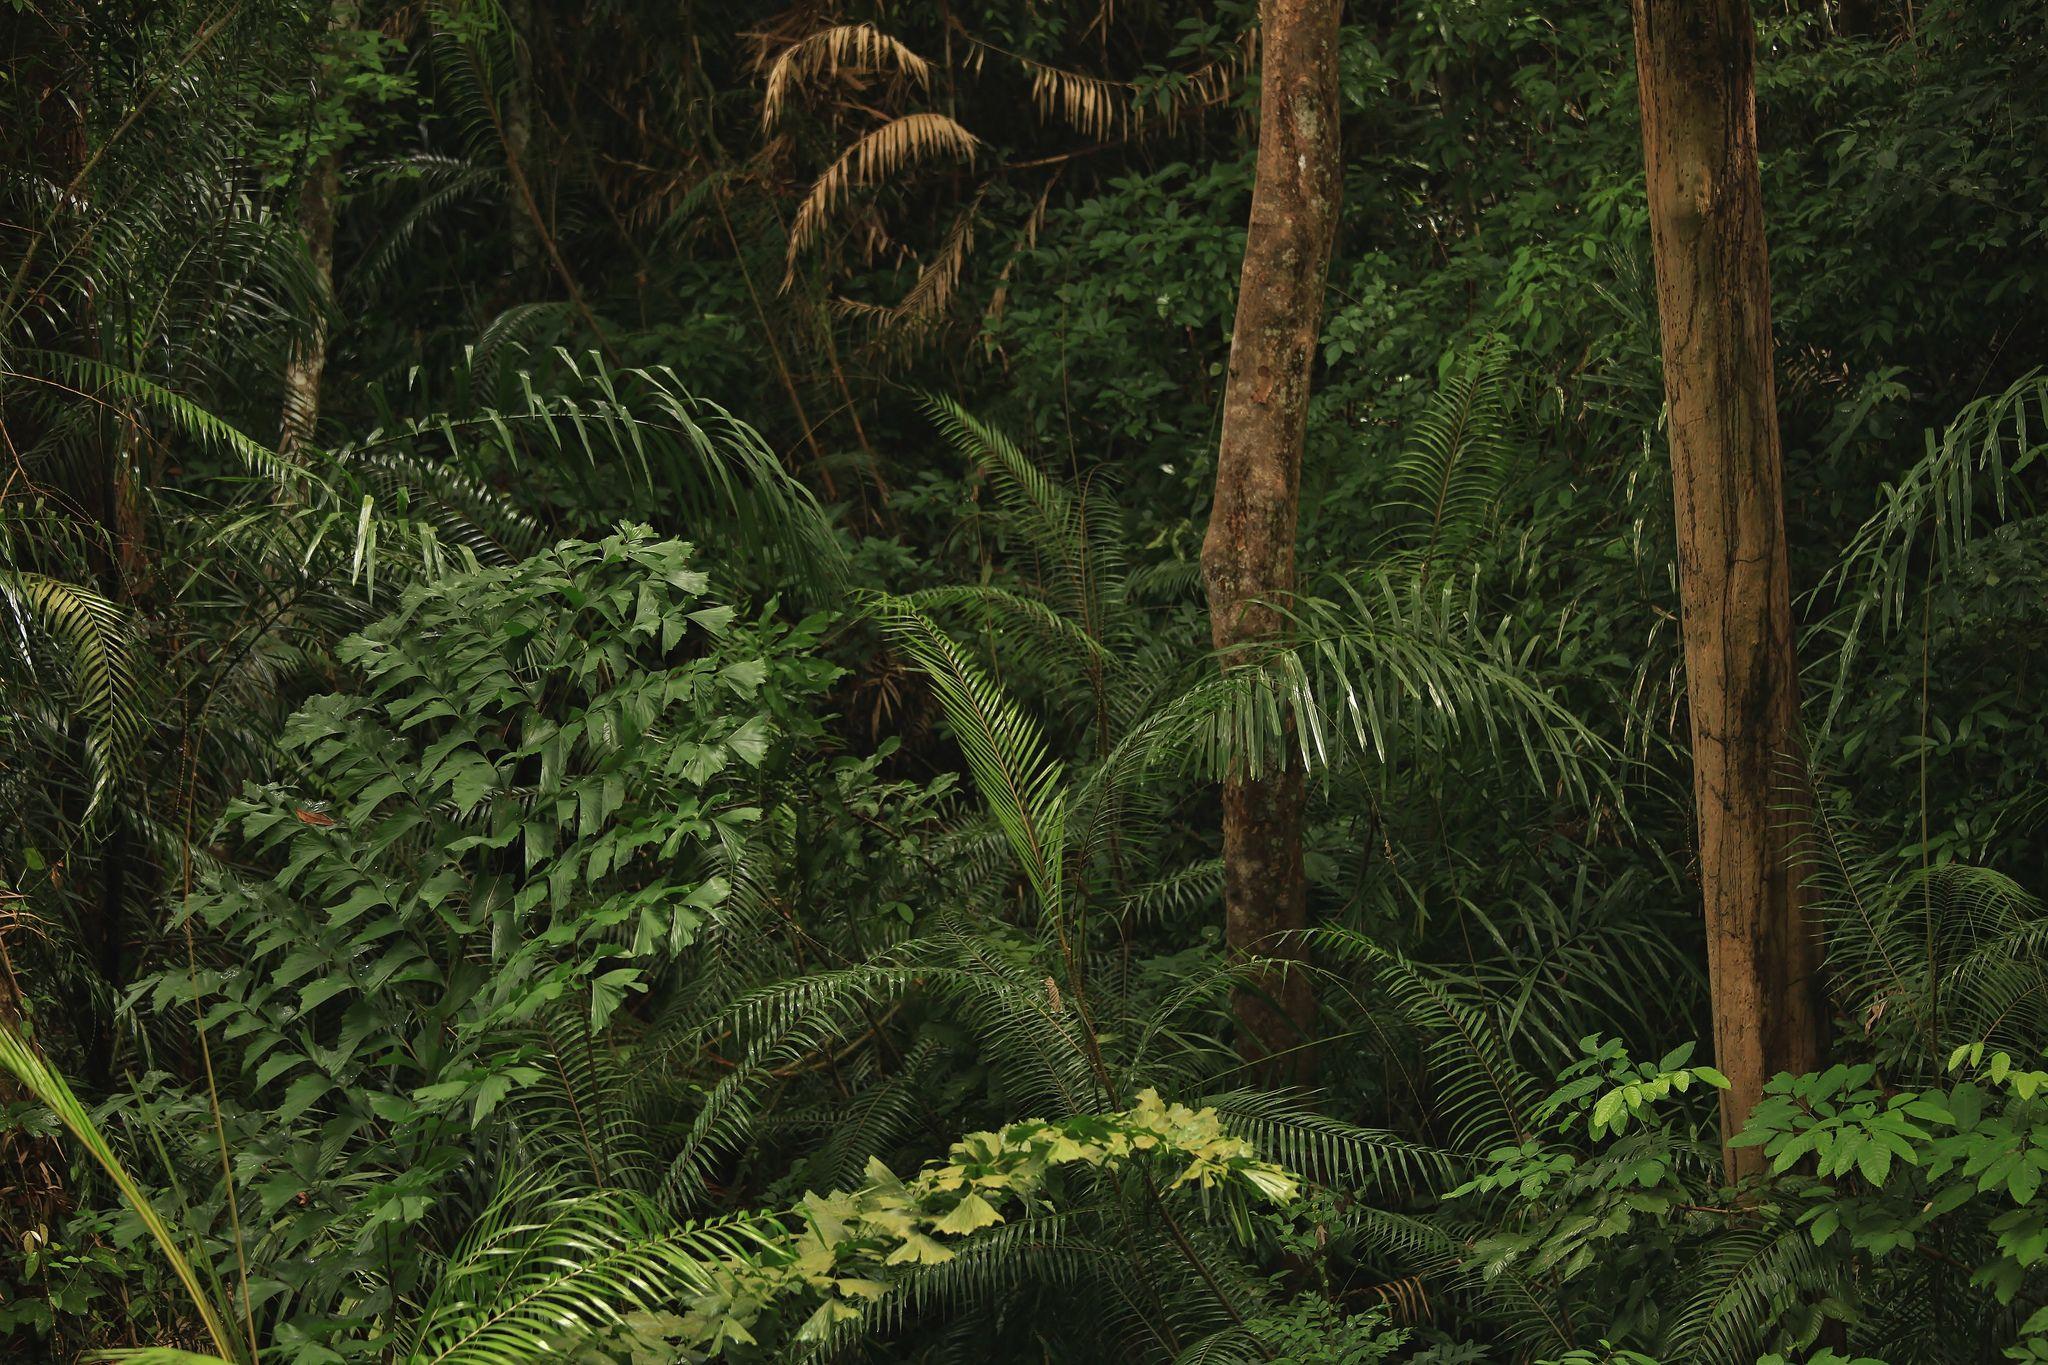 Httpsflickrp25Ejecj - Img 2151 Jungles On Langkawi